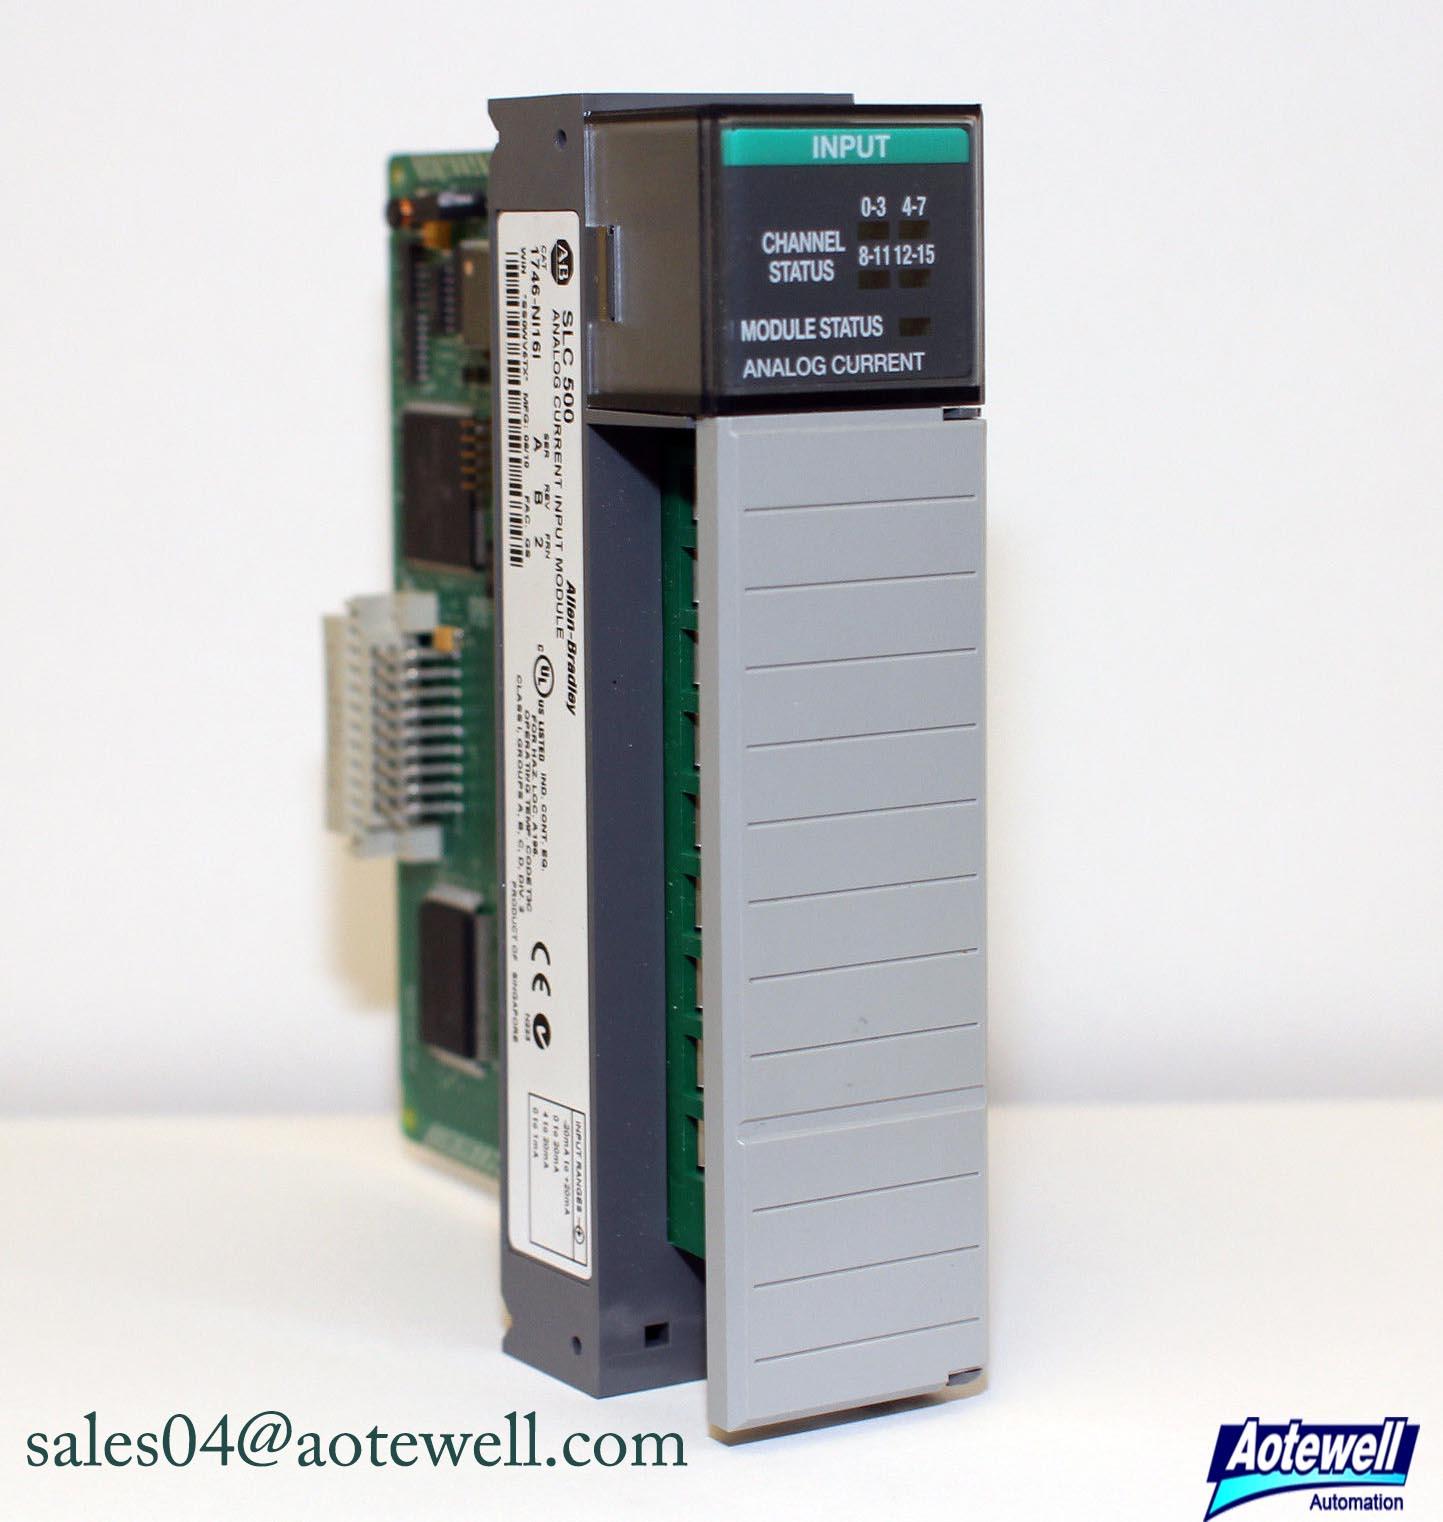 Allen Bradley Slc Plc 500 1747 Systerm Series